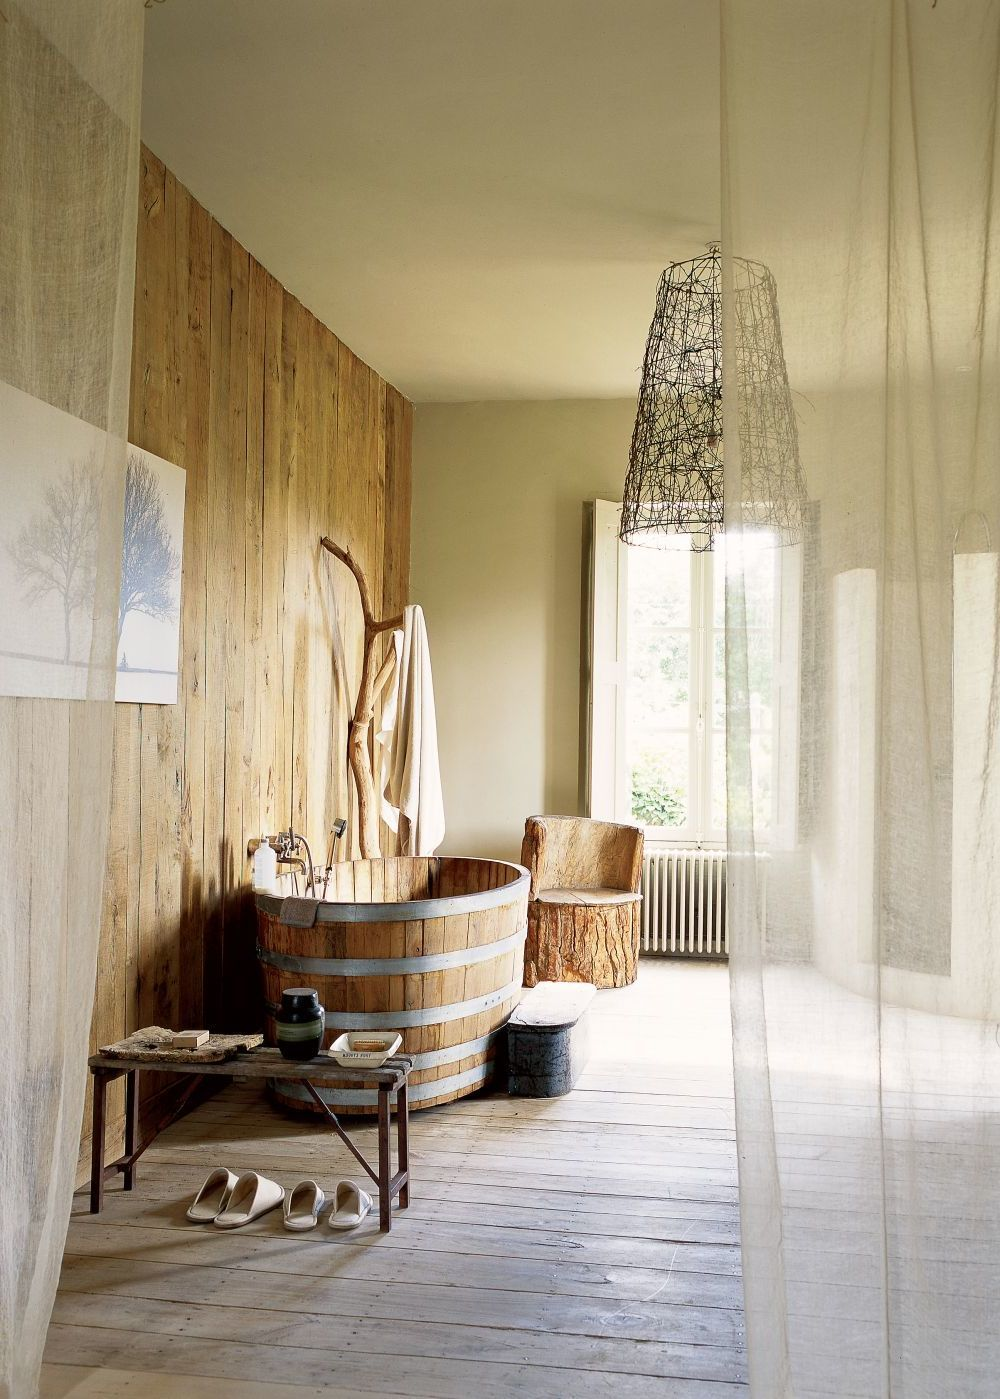 Schön Badgestaltung Ideen Ideen Von Badgetsaltung In Hellen Warmen Farben Holzoptik Wand